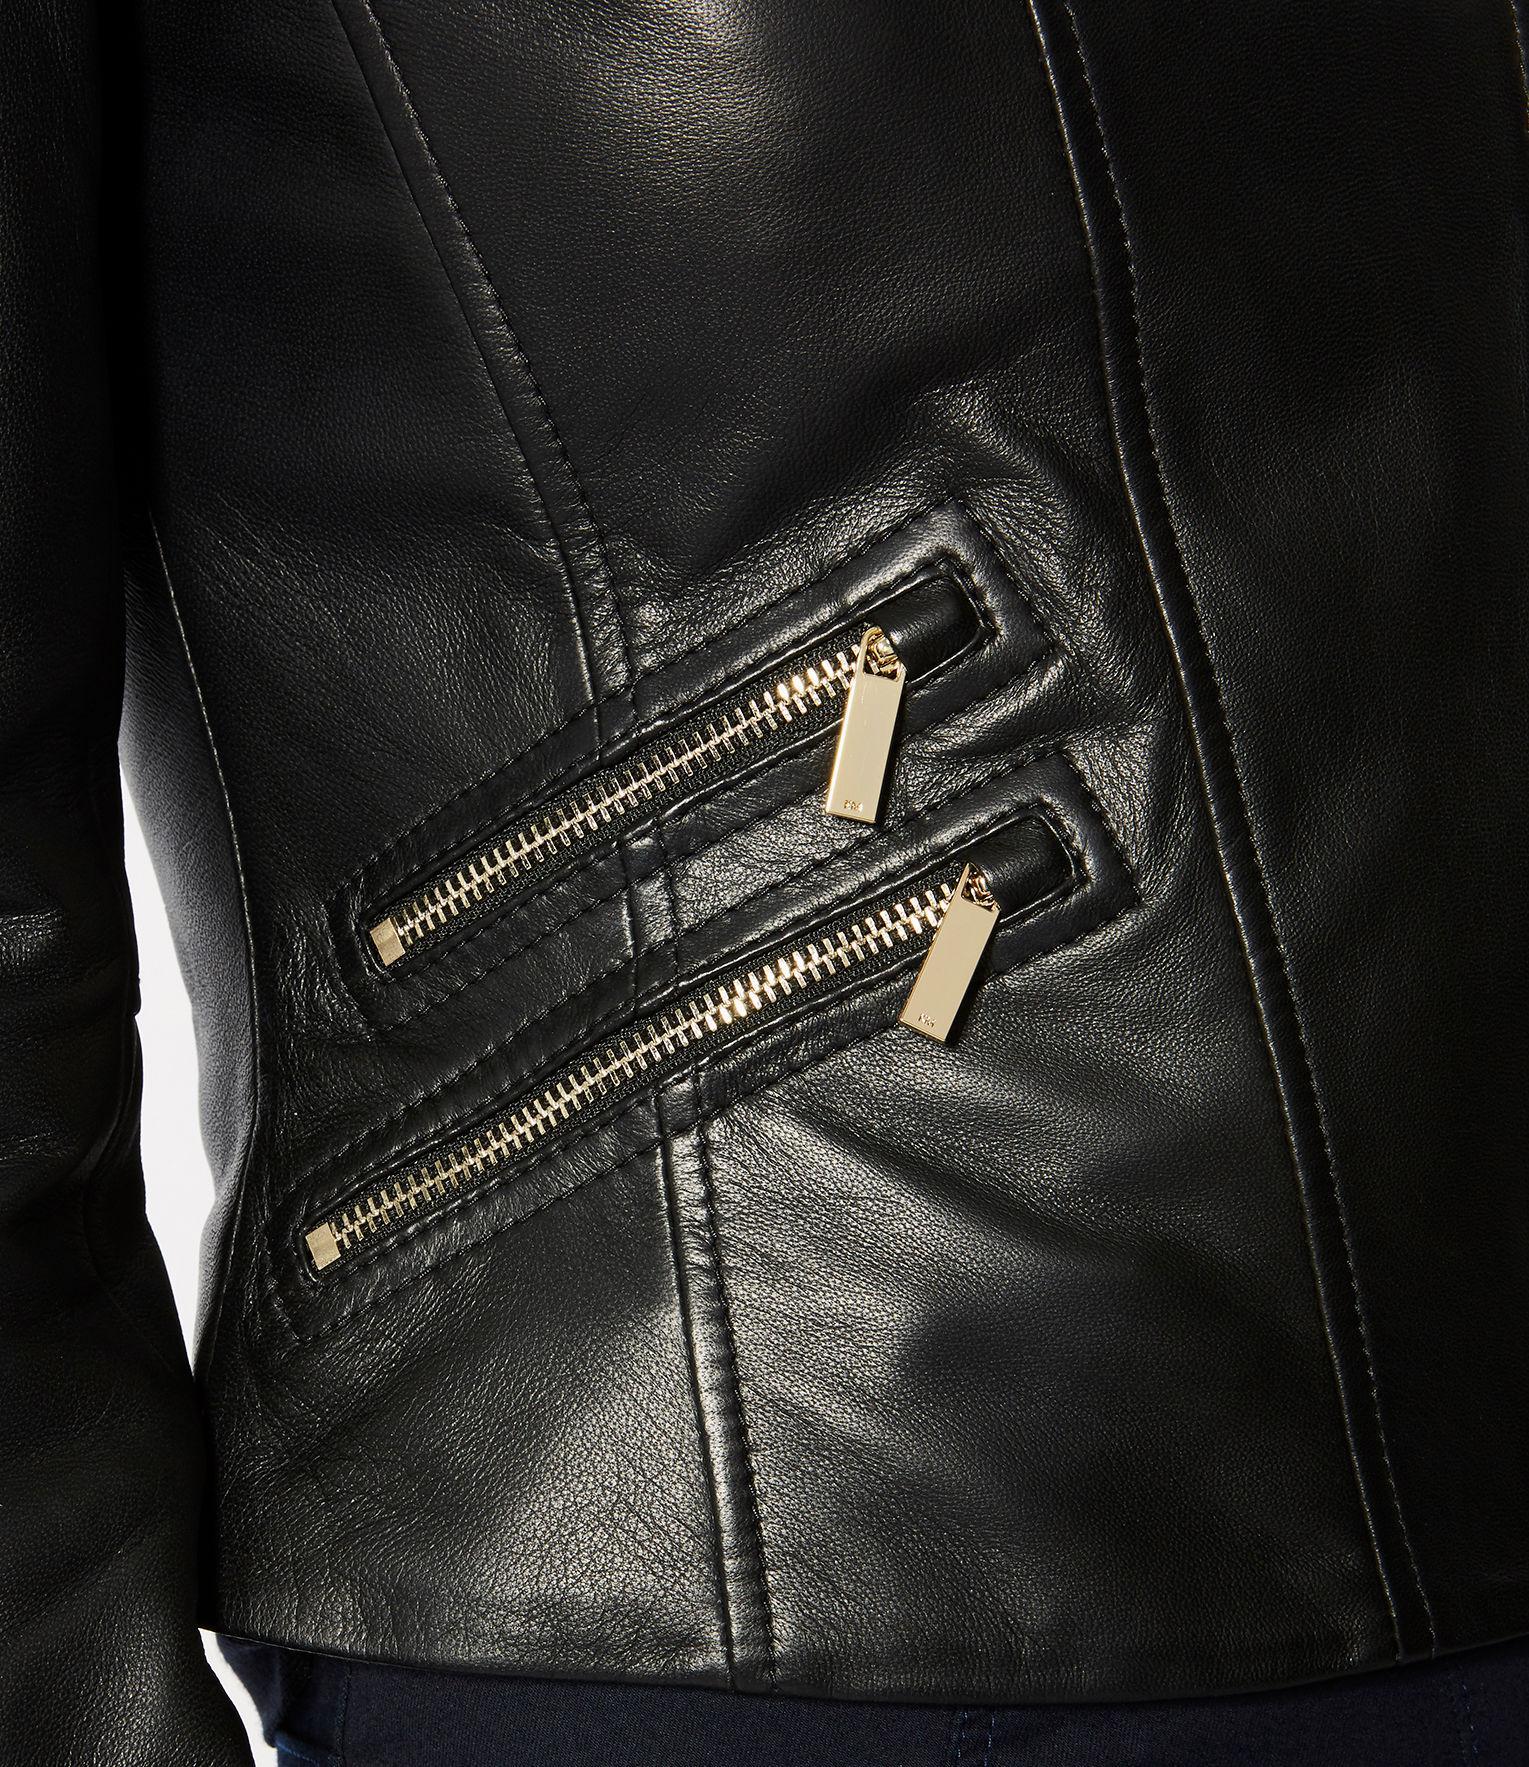 6cfb1d91c Karen Millen Black Leather Jacket Gold Trims